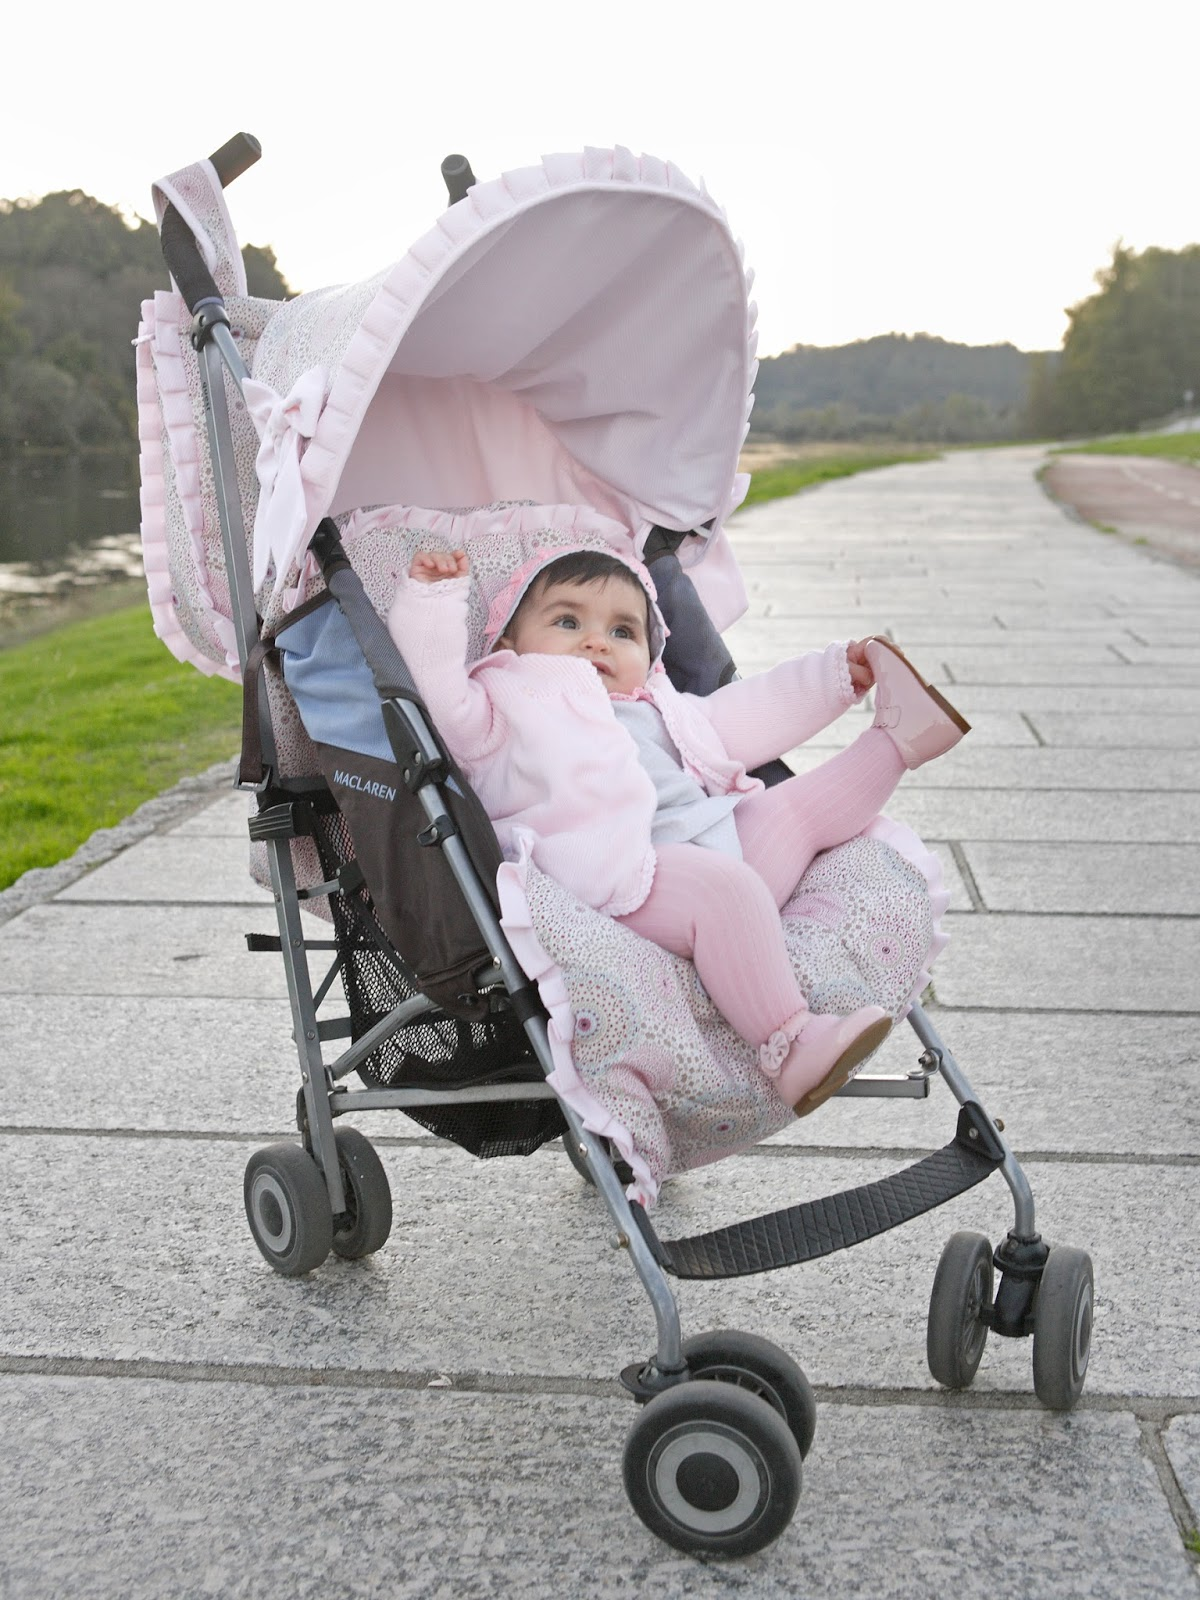 Silla maclaren personalizada unikko beb s sacos de for Saco para silla maclaren